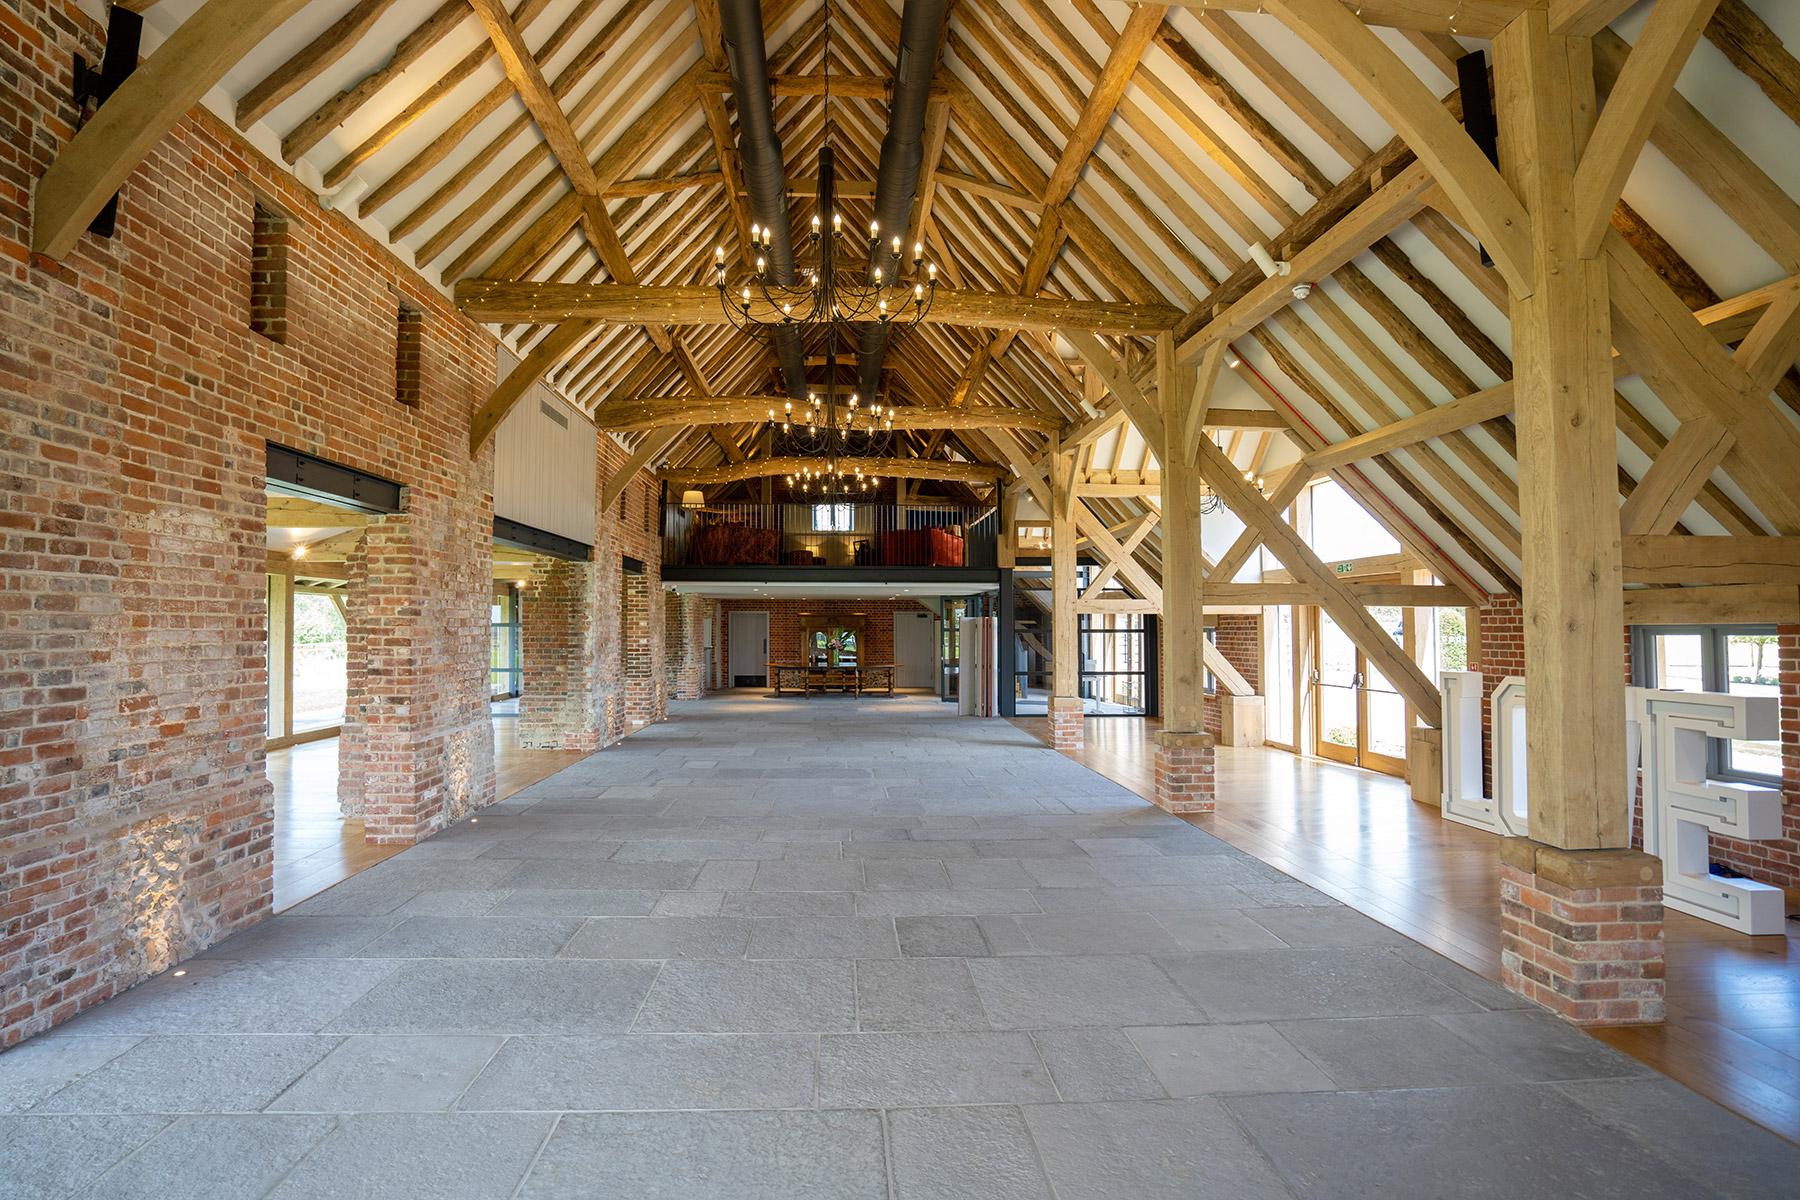 Rackleys Wedding Barn Venue Interior Buckinghamshire